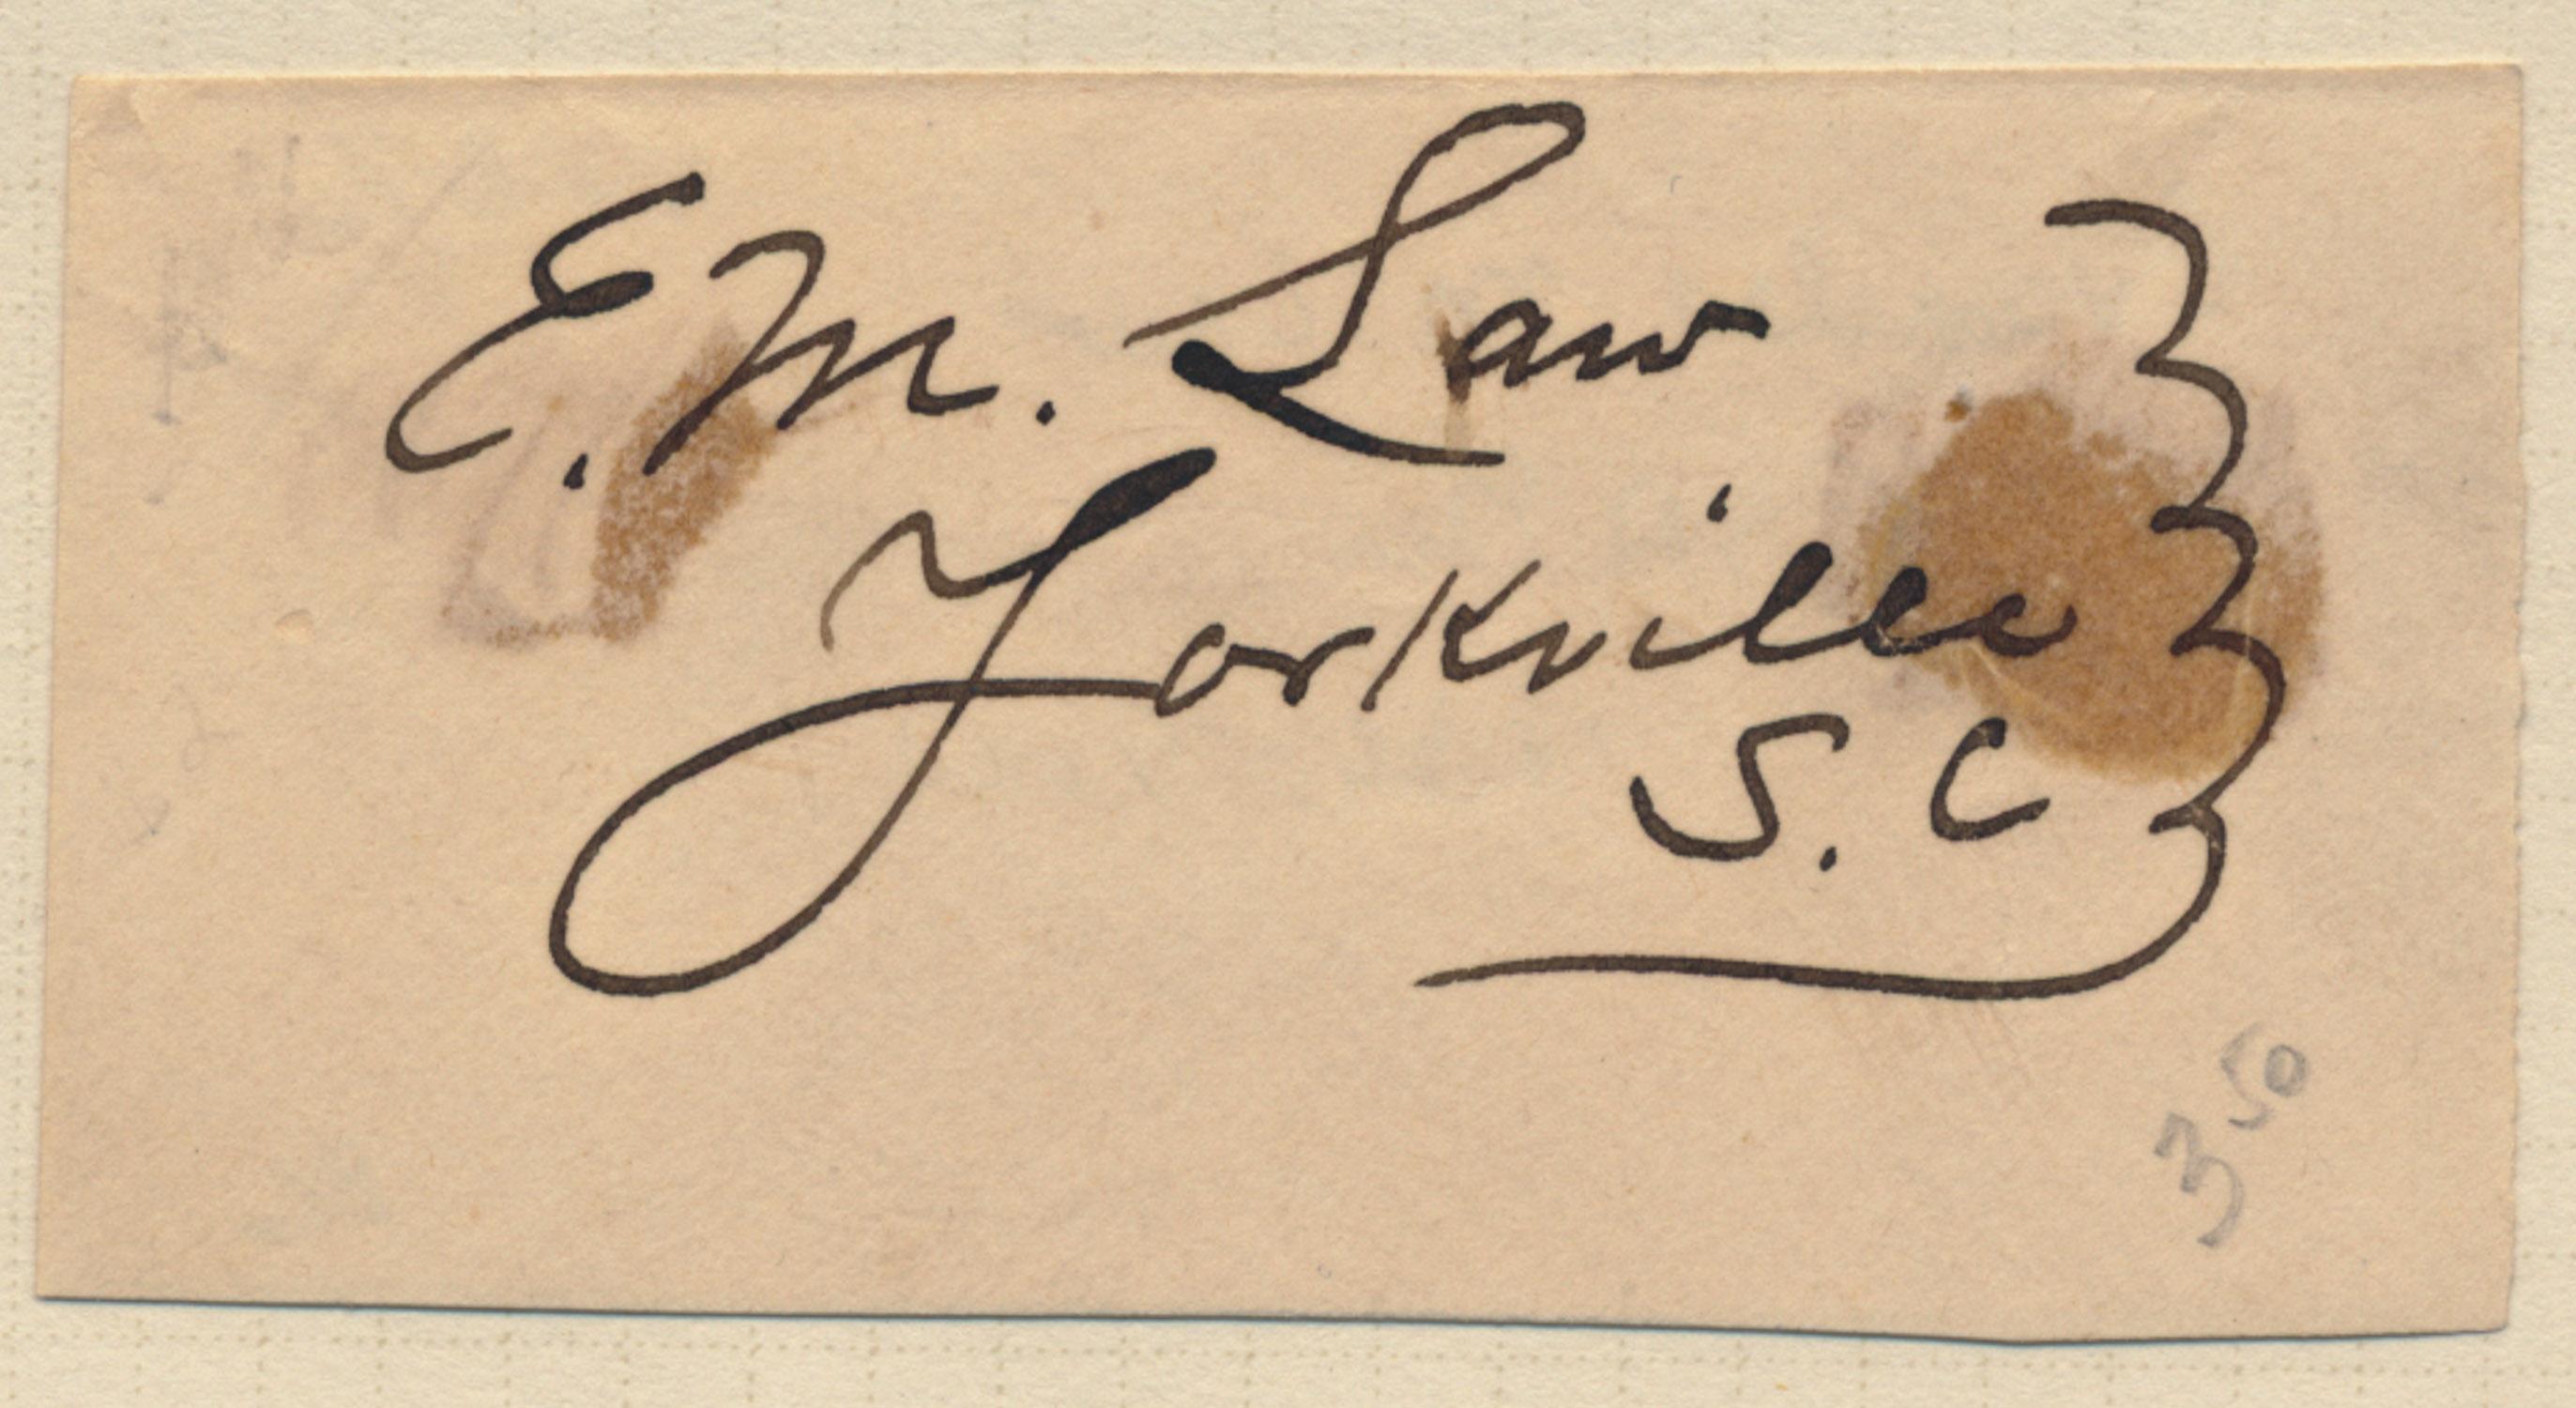 EVANDER M. LAW